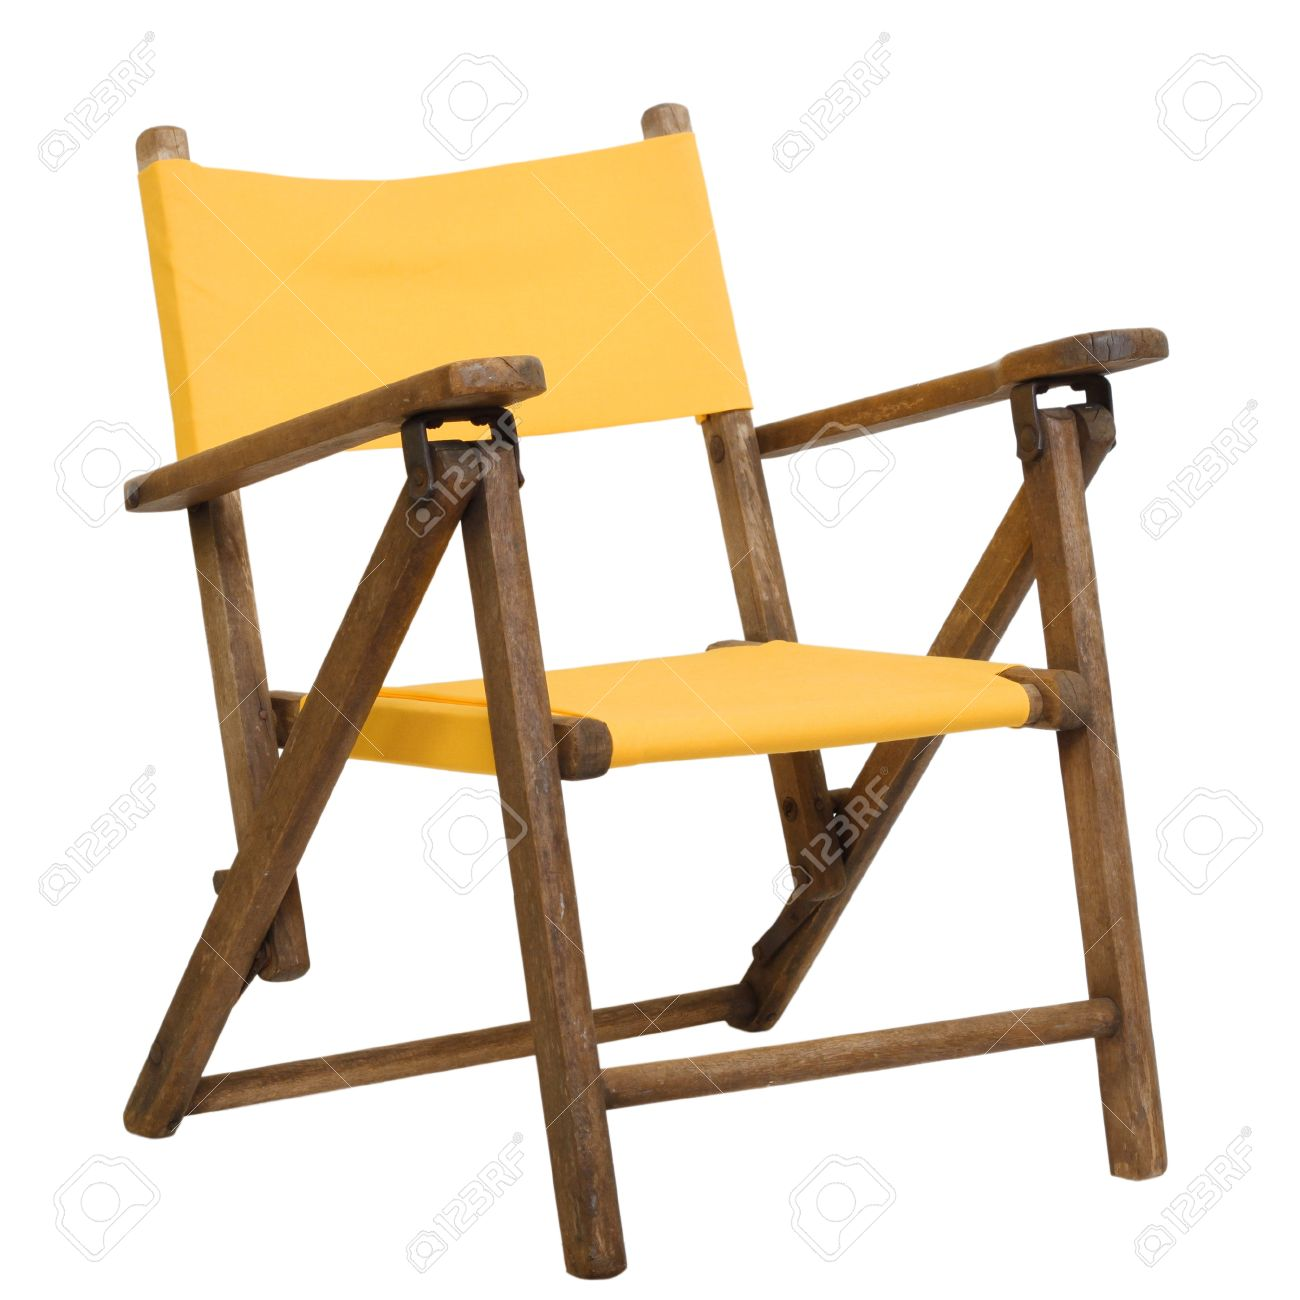 Super Antique Folding Canvas Childrens Lawn Chair In Bright Yellow Machost Co Dining Chair Design Ideas Machostcouk